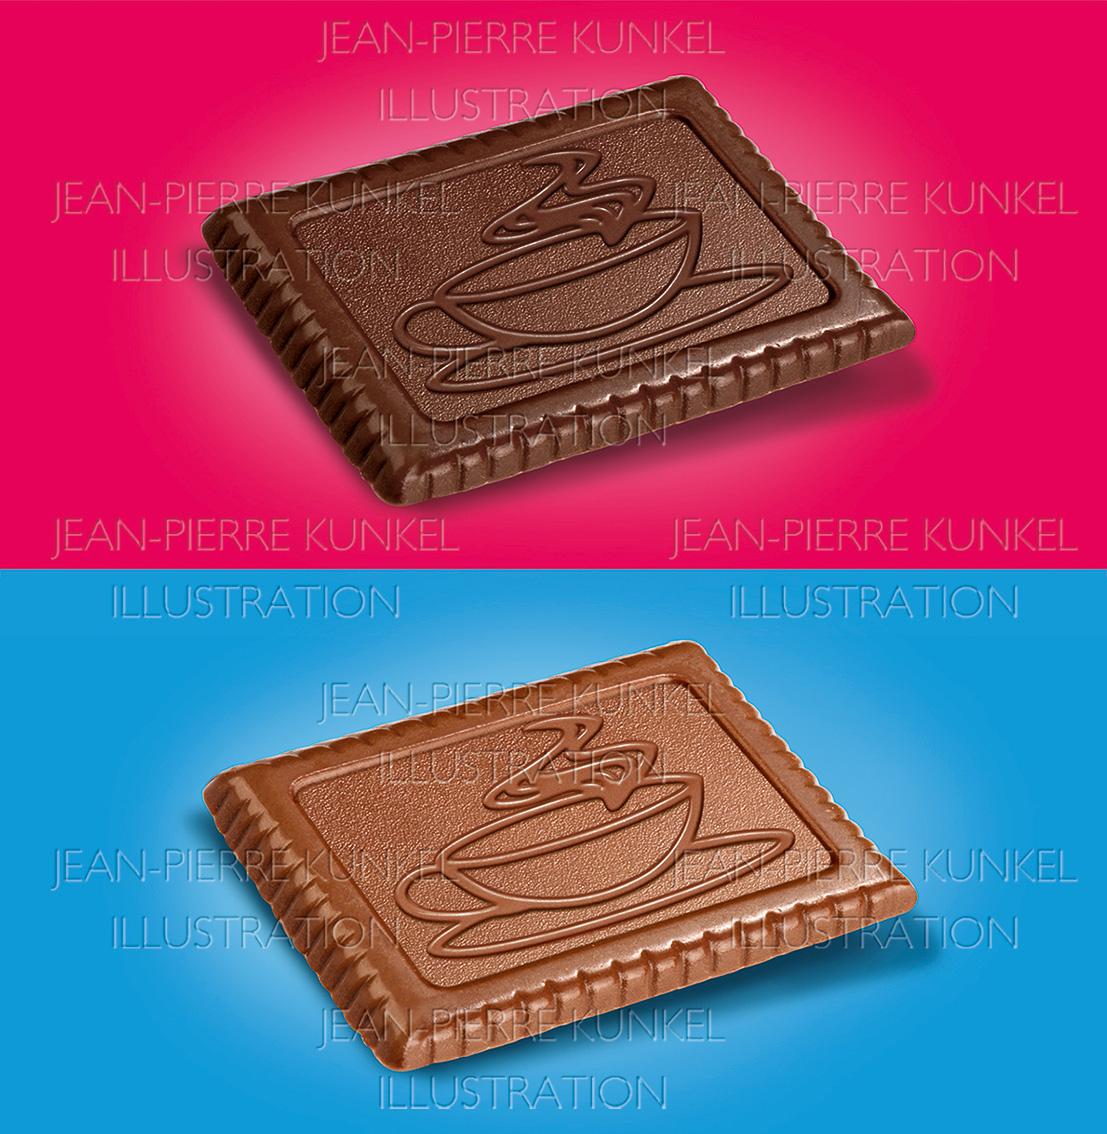 Zwei Schokoladenkekse